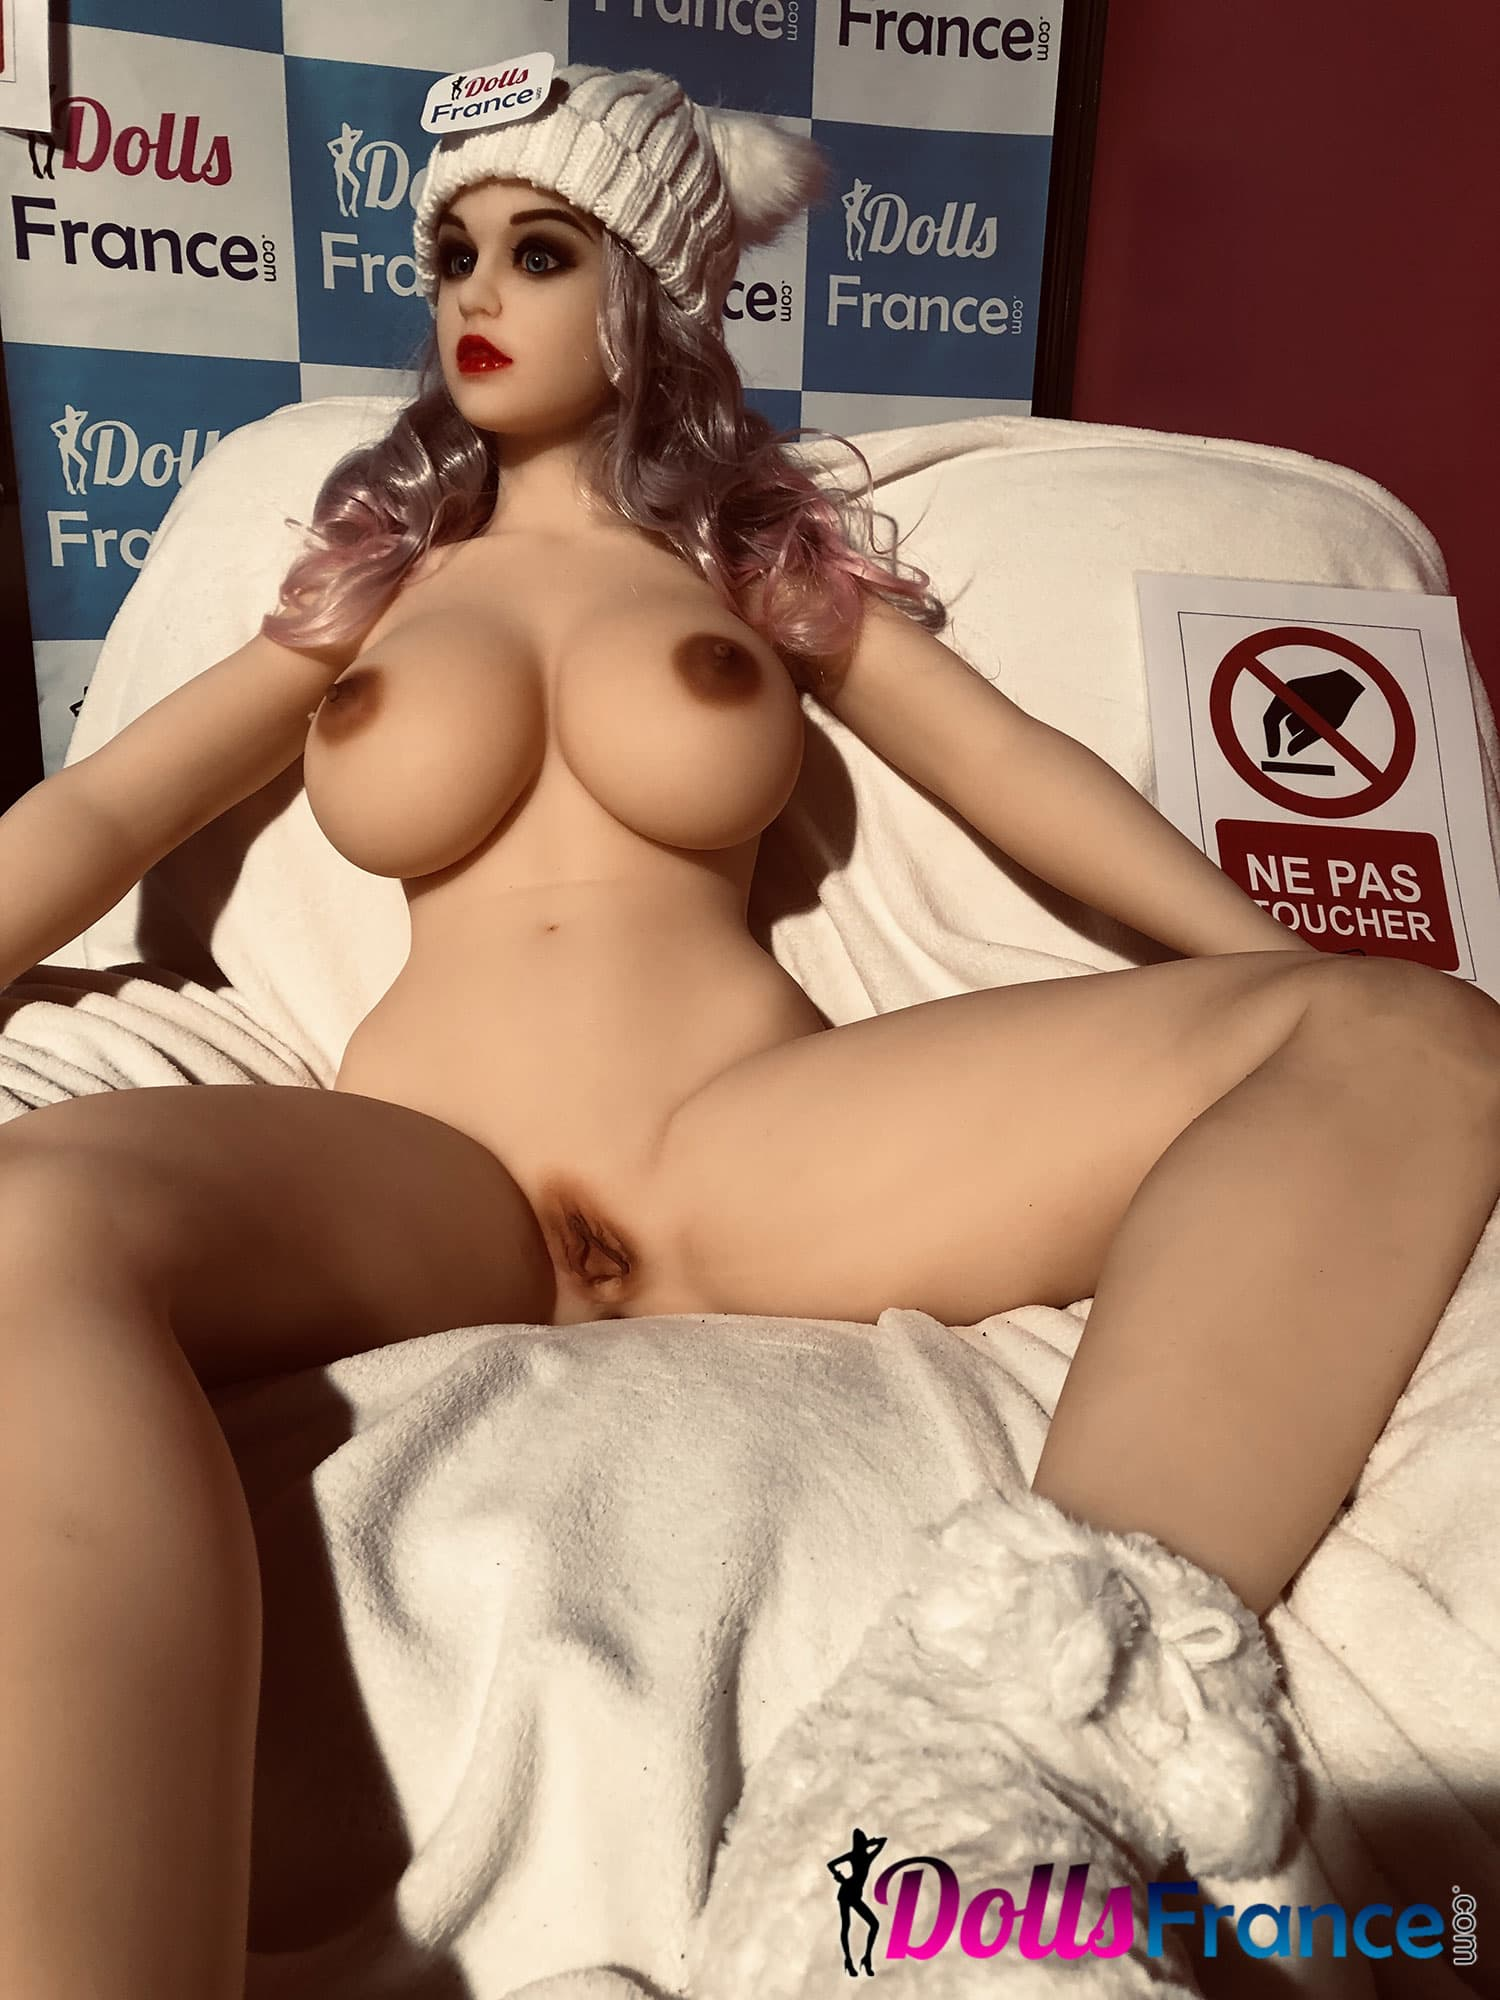 Beth 1m60 piper doll poupée réaliste dollsfrance